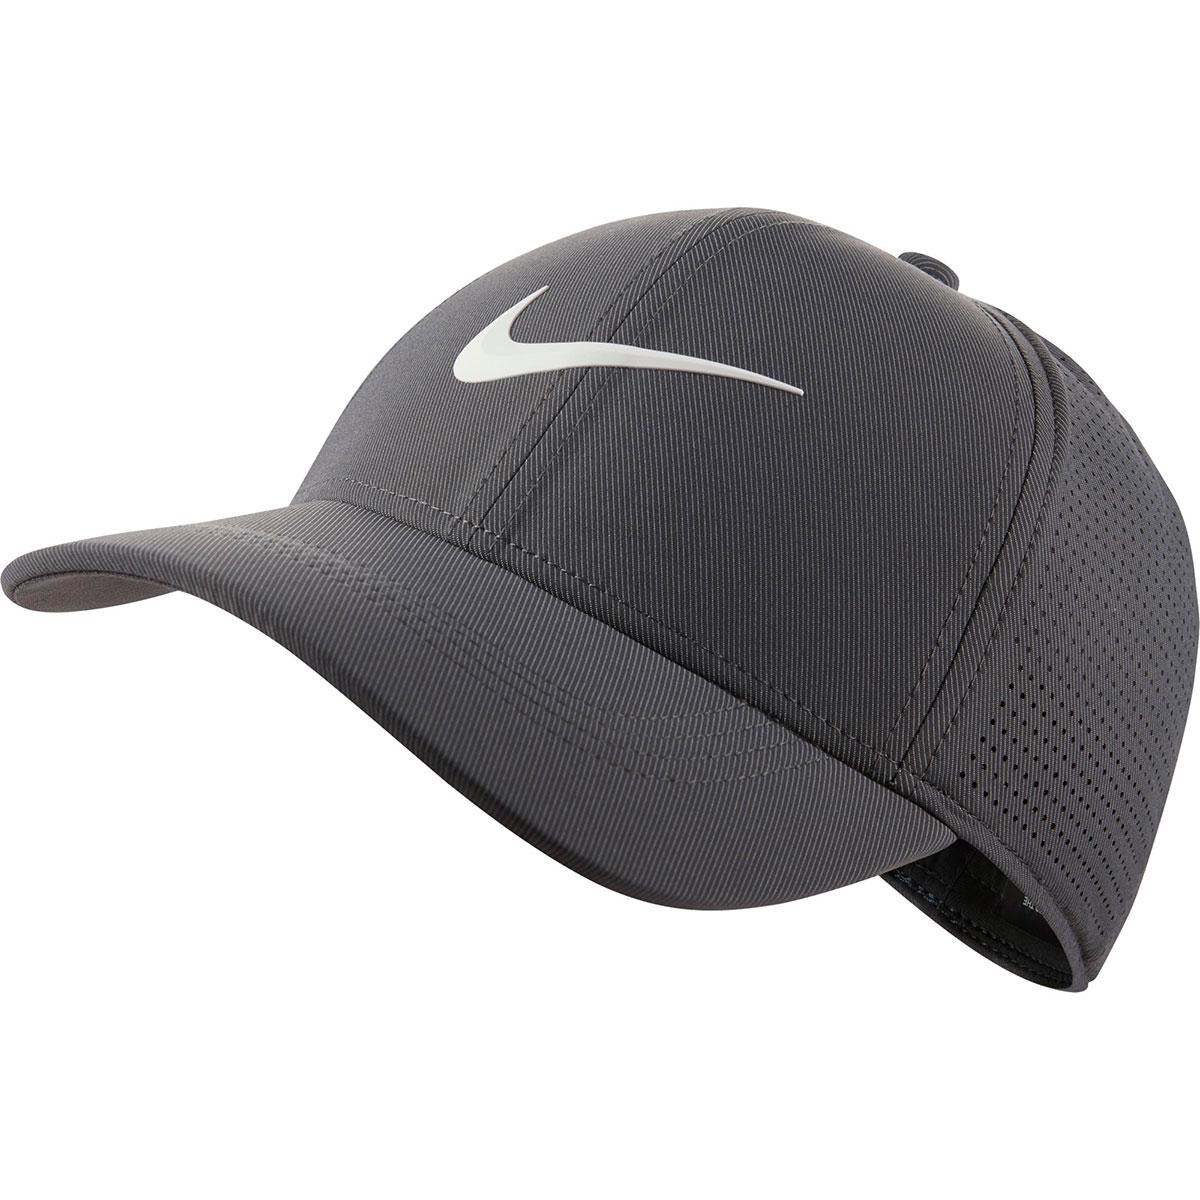 54b2e93e53bca7 Nike Golf AeroBill Legacy91 Cap from american golf